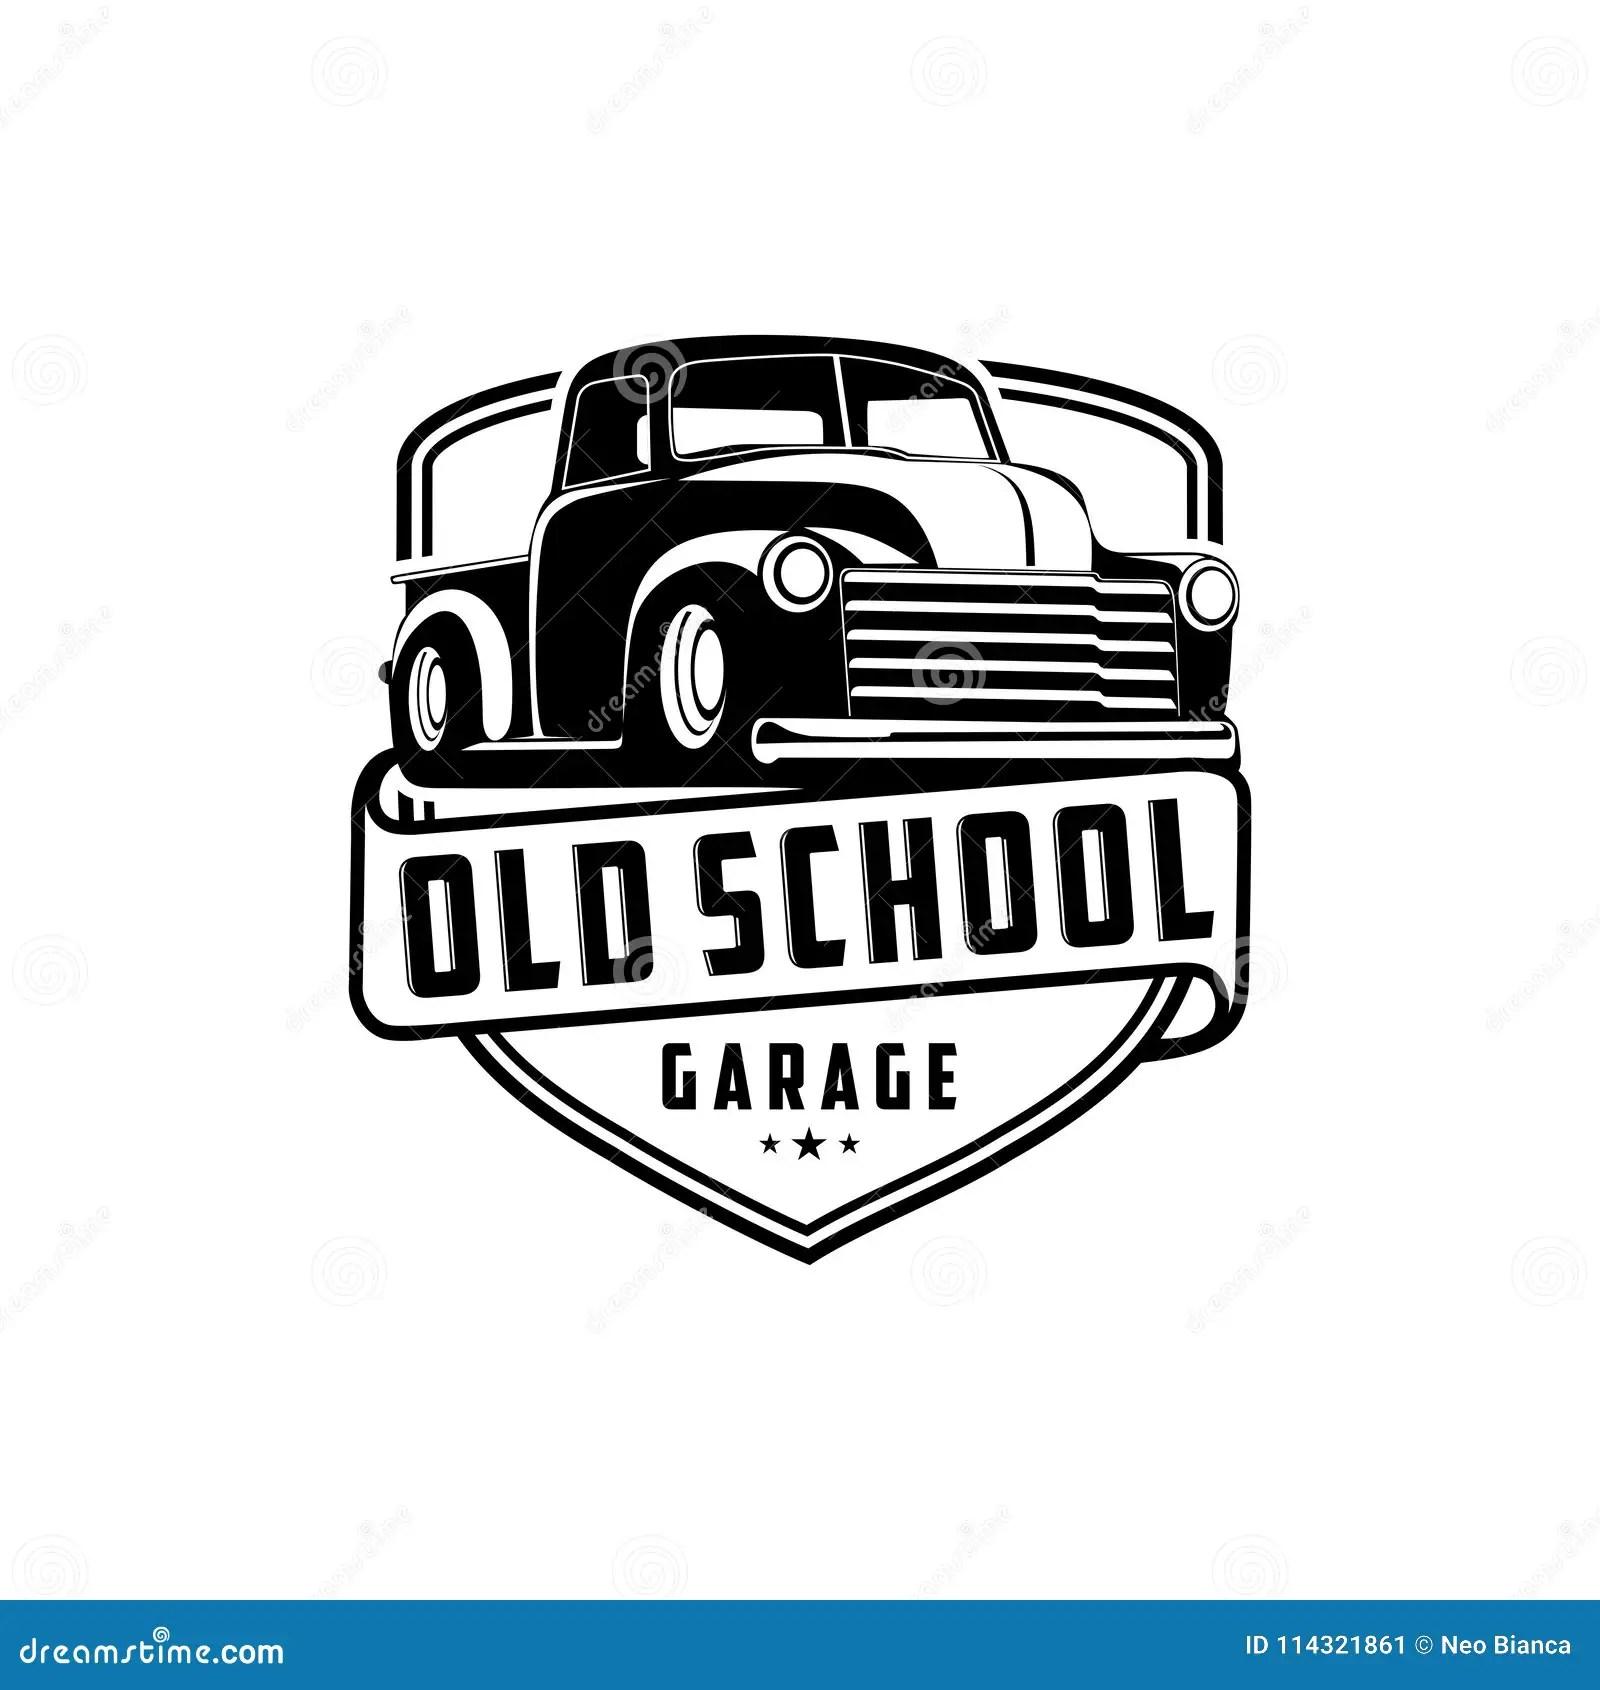 Cool Car Logos